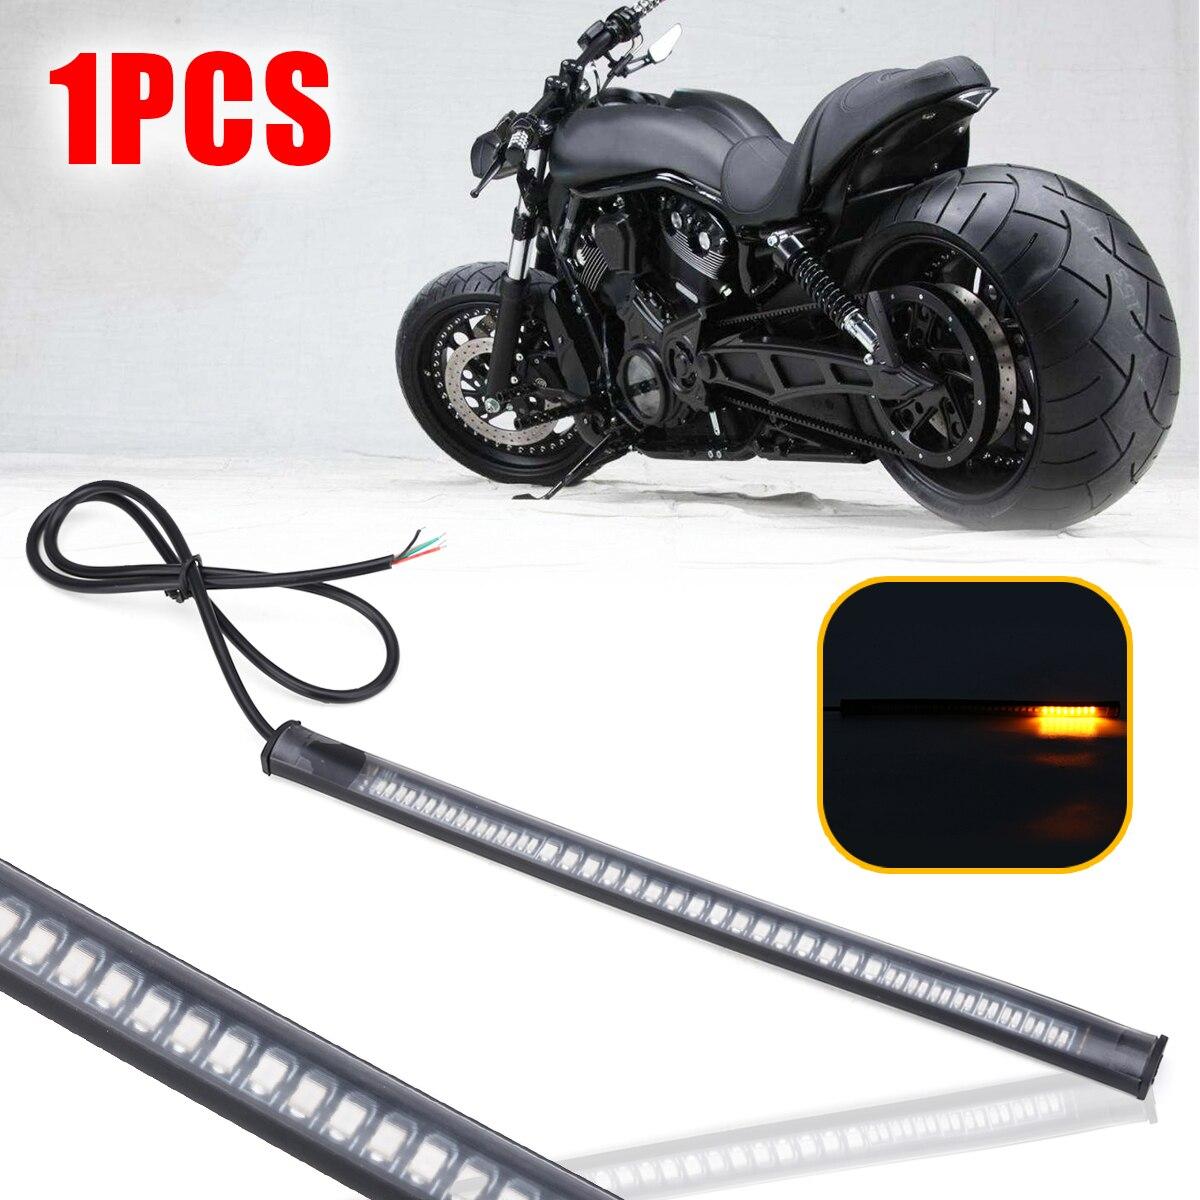 1PC DC 12V Flexible 48 LED SMD Strip Motorcycle Car Amber Turn Signal Light Red Brake Stop Lamp Super Bright 3528